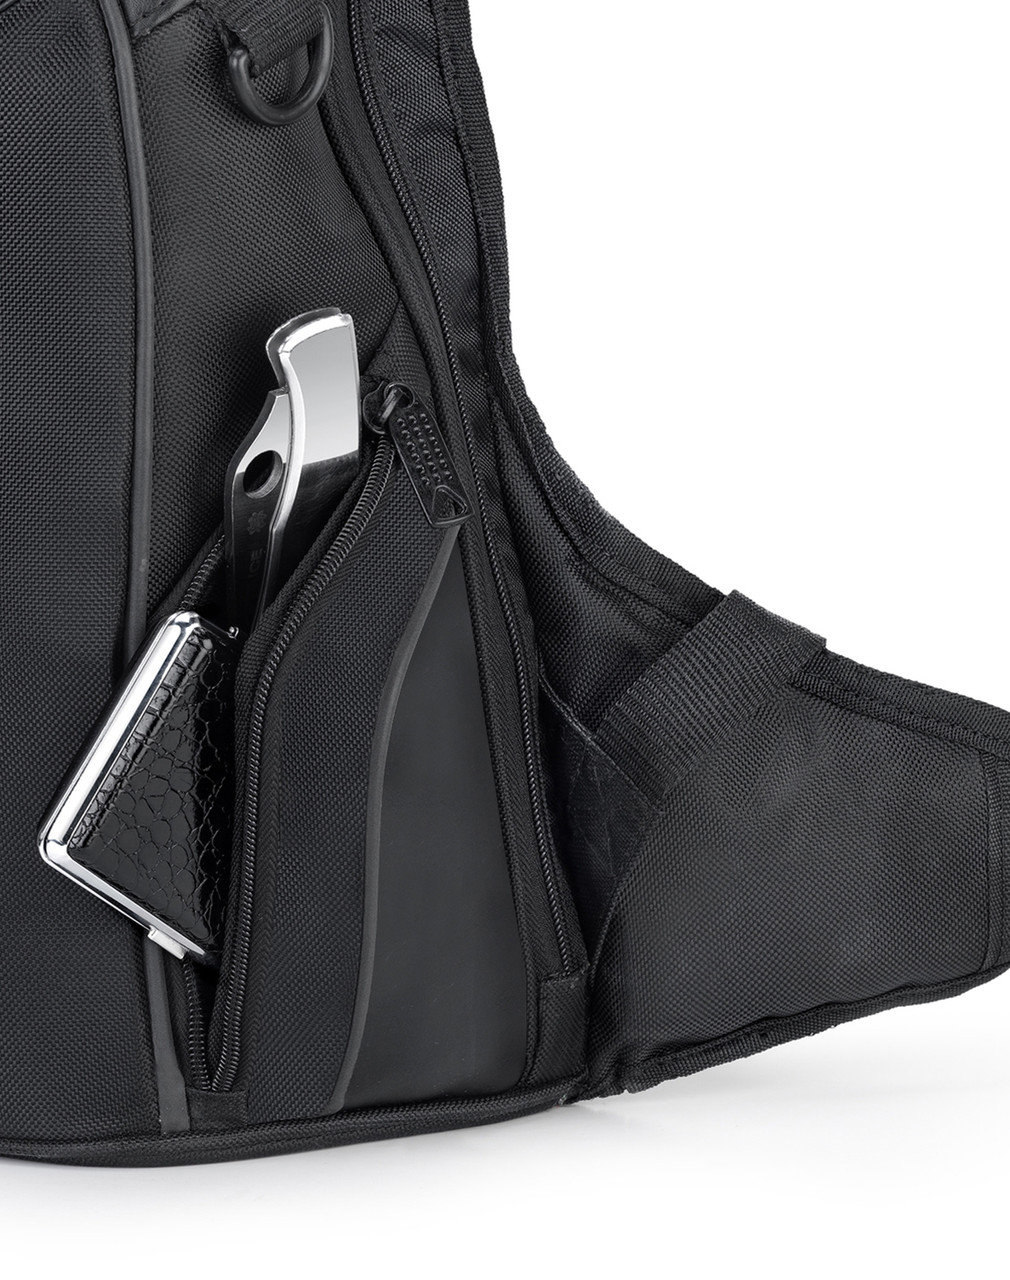 VikingBags AXE Medium Victory Motorcycle Backpack Front Pocket